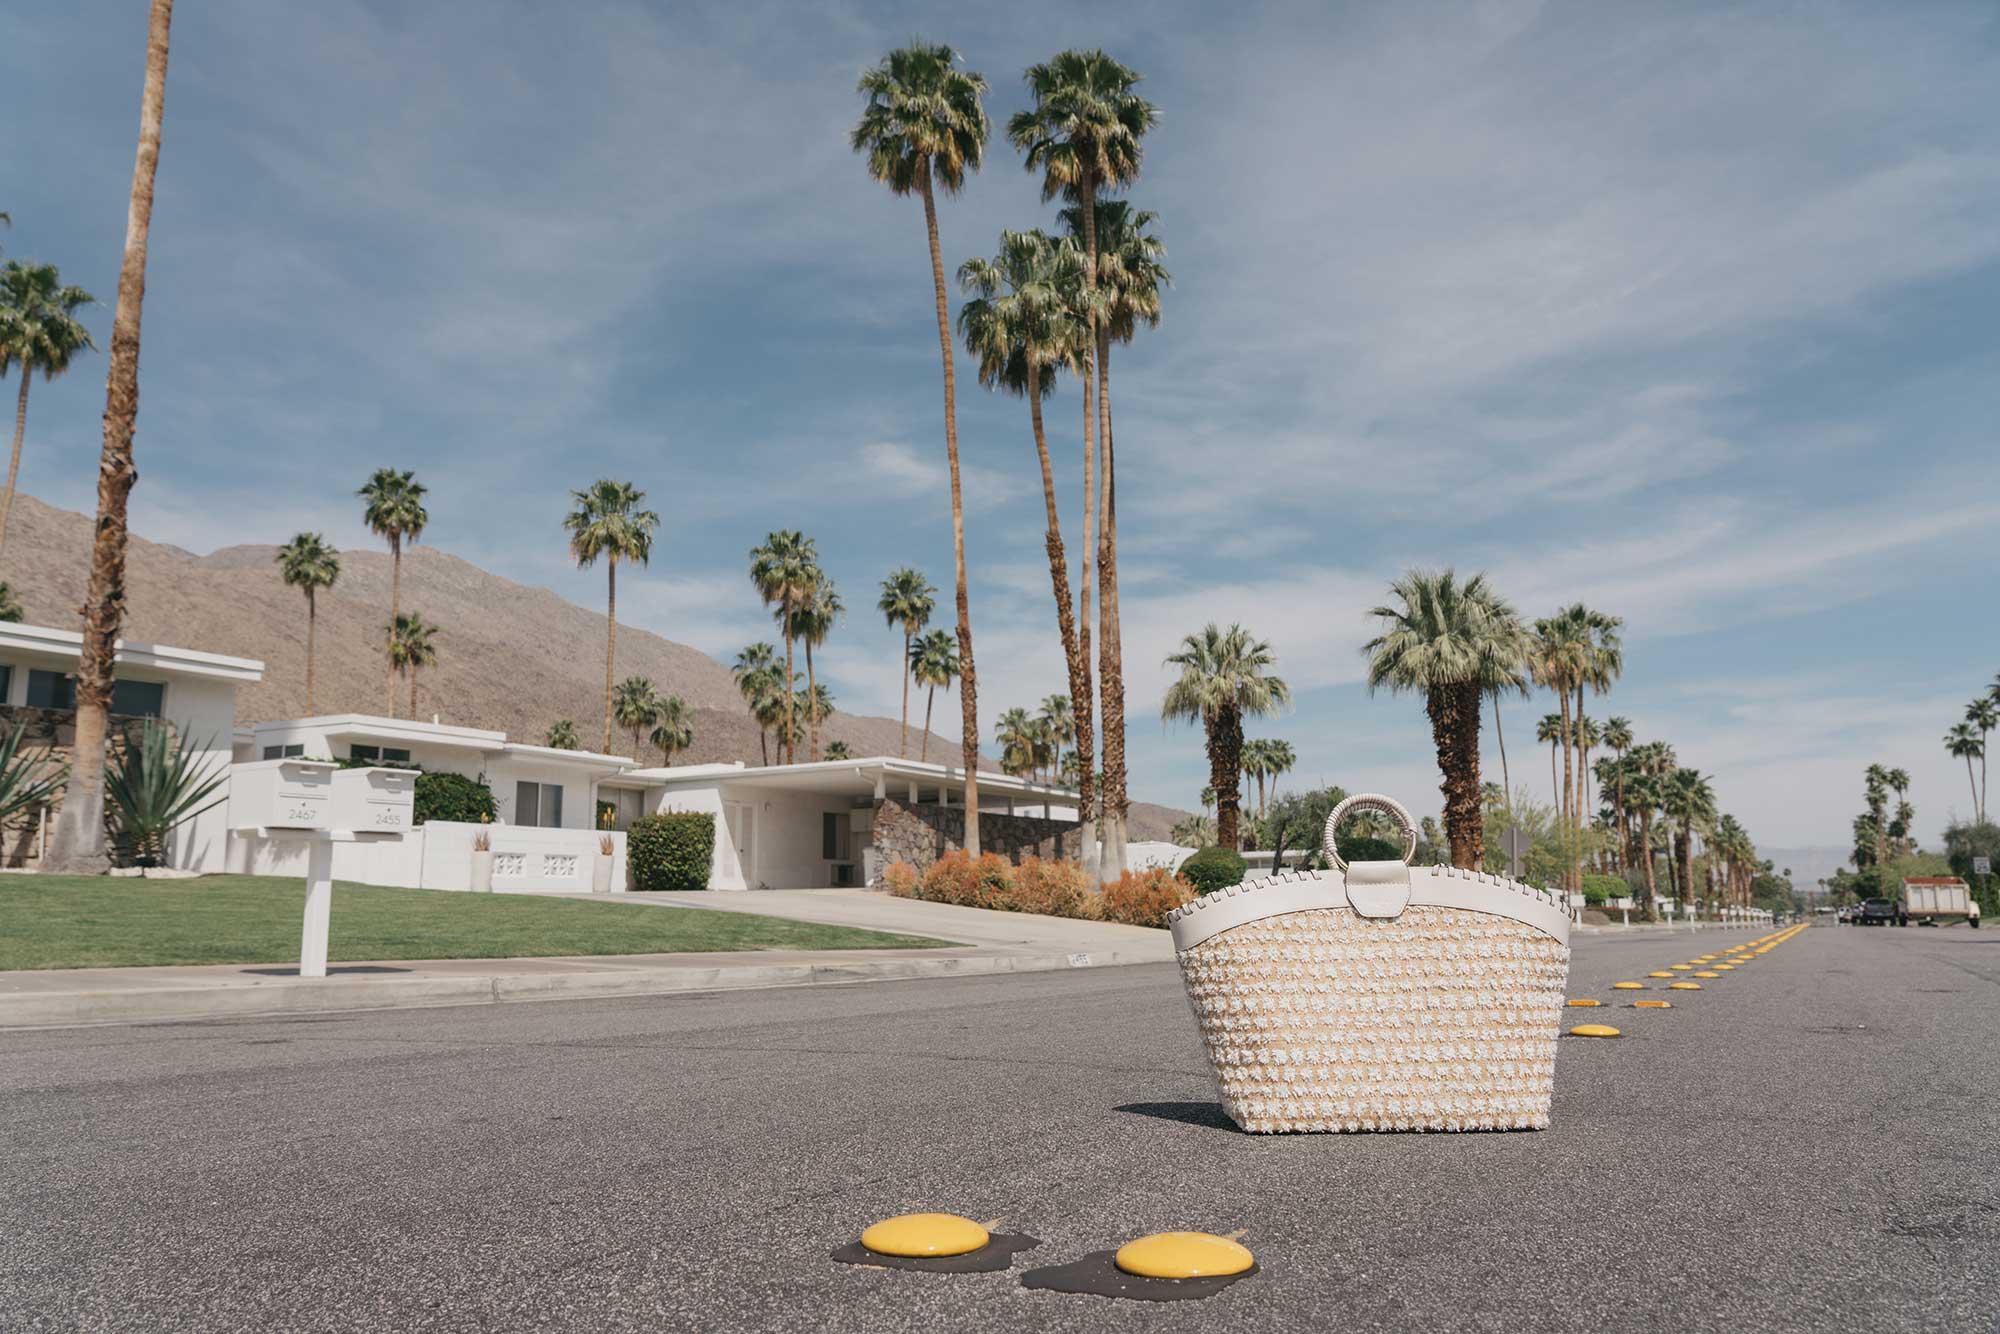 Cynthia Rowley Short sleeve cotton ruffle wrap dress Palm Springs Outfit6.jpg